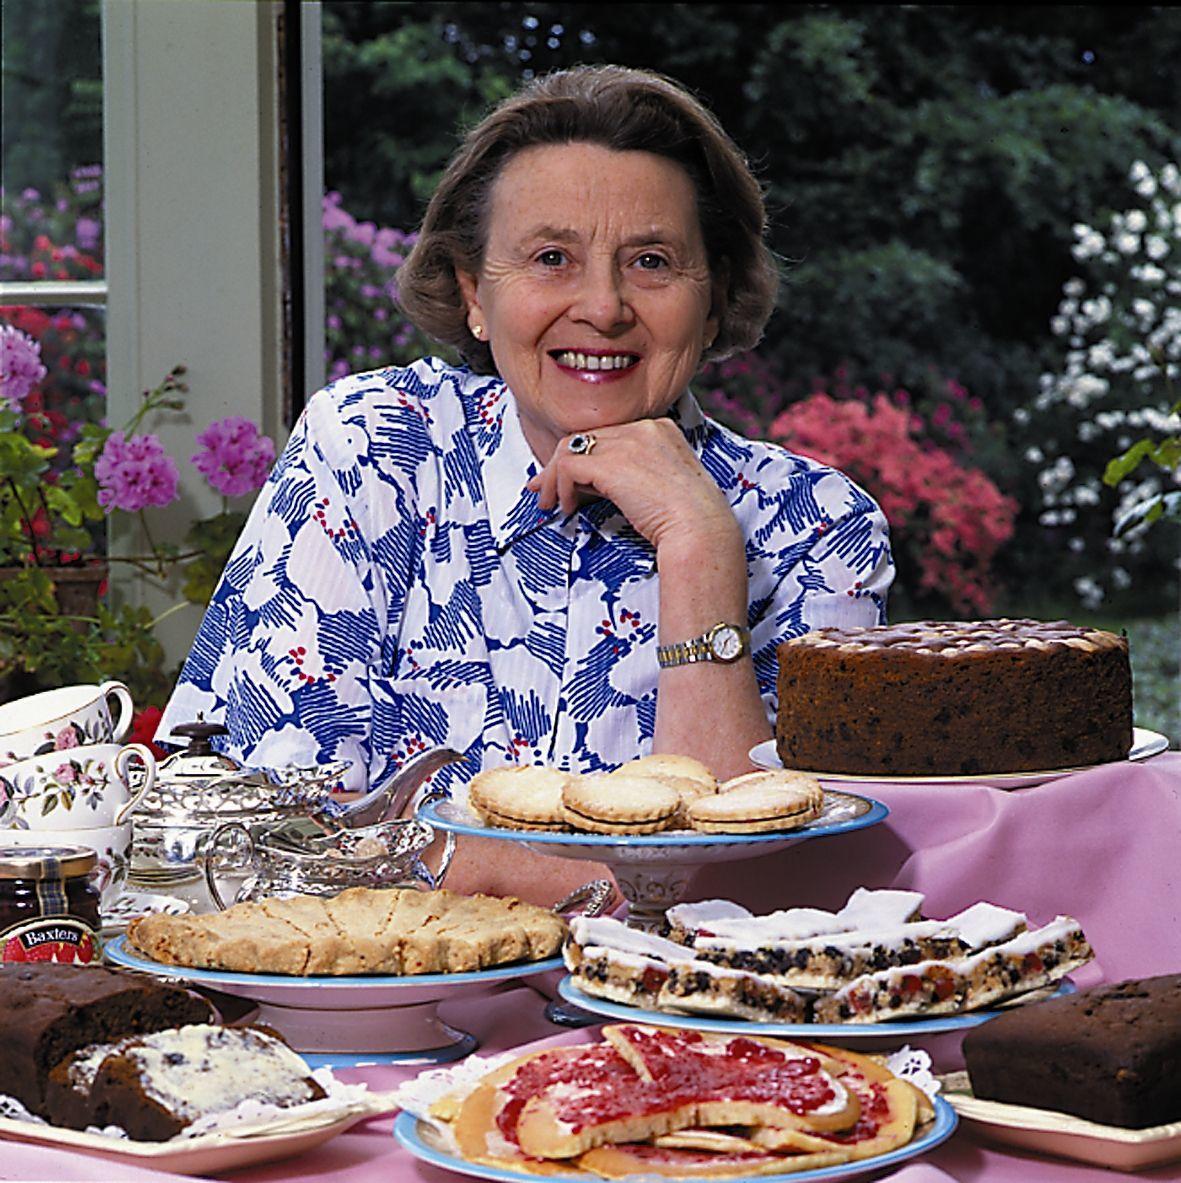 Ena Baxter died aged 90